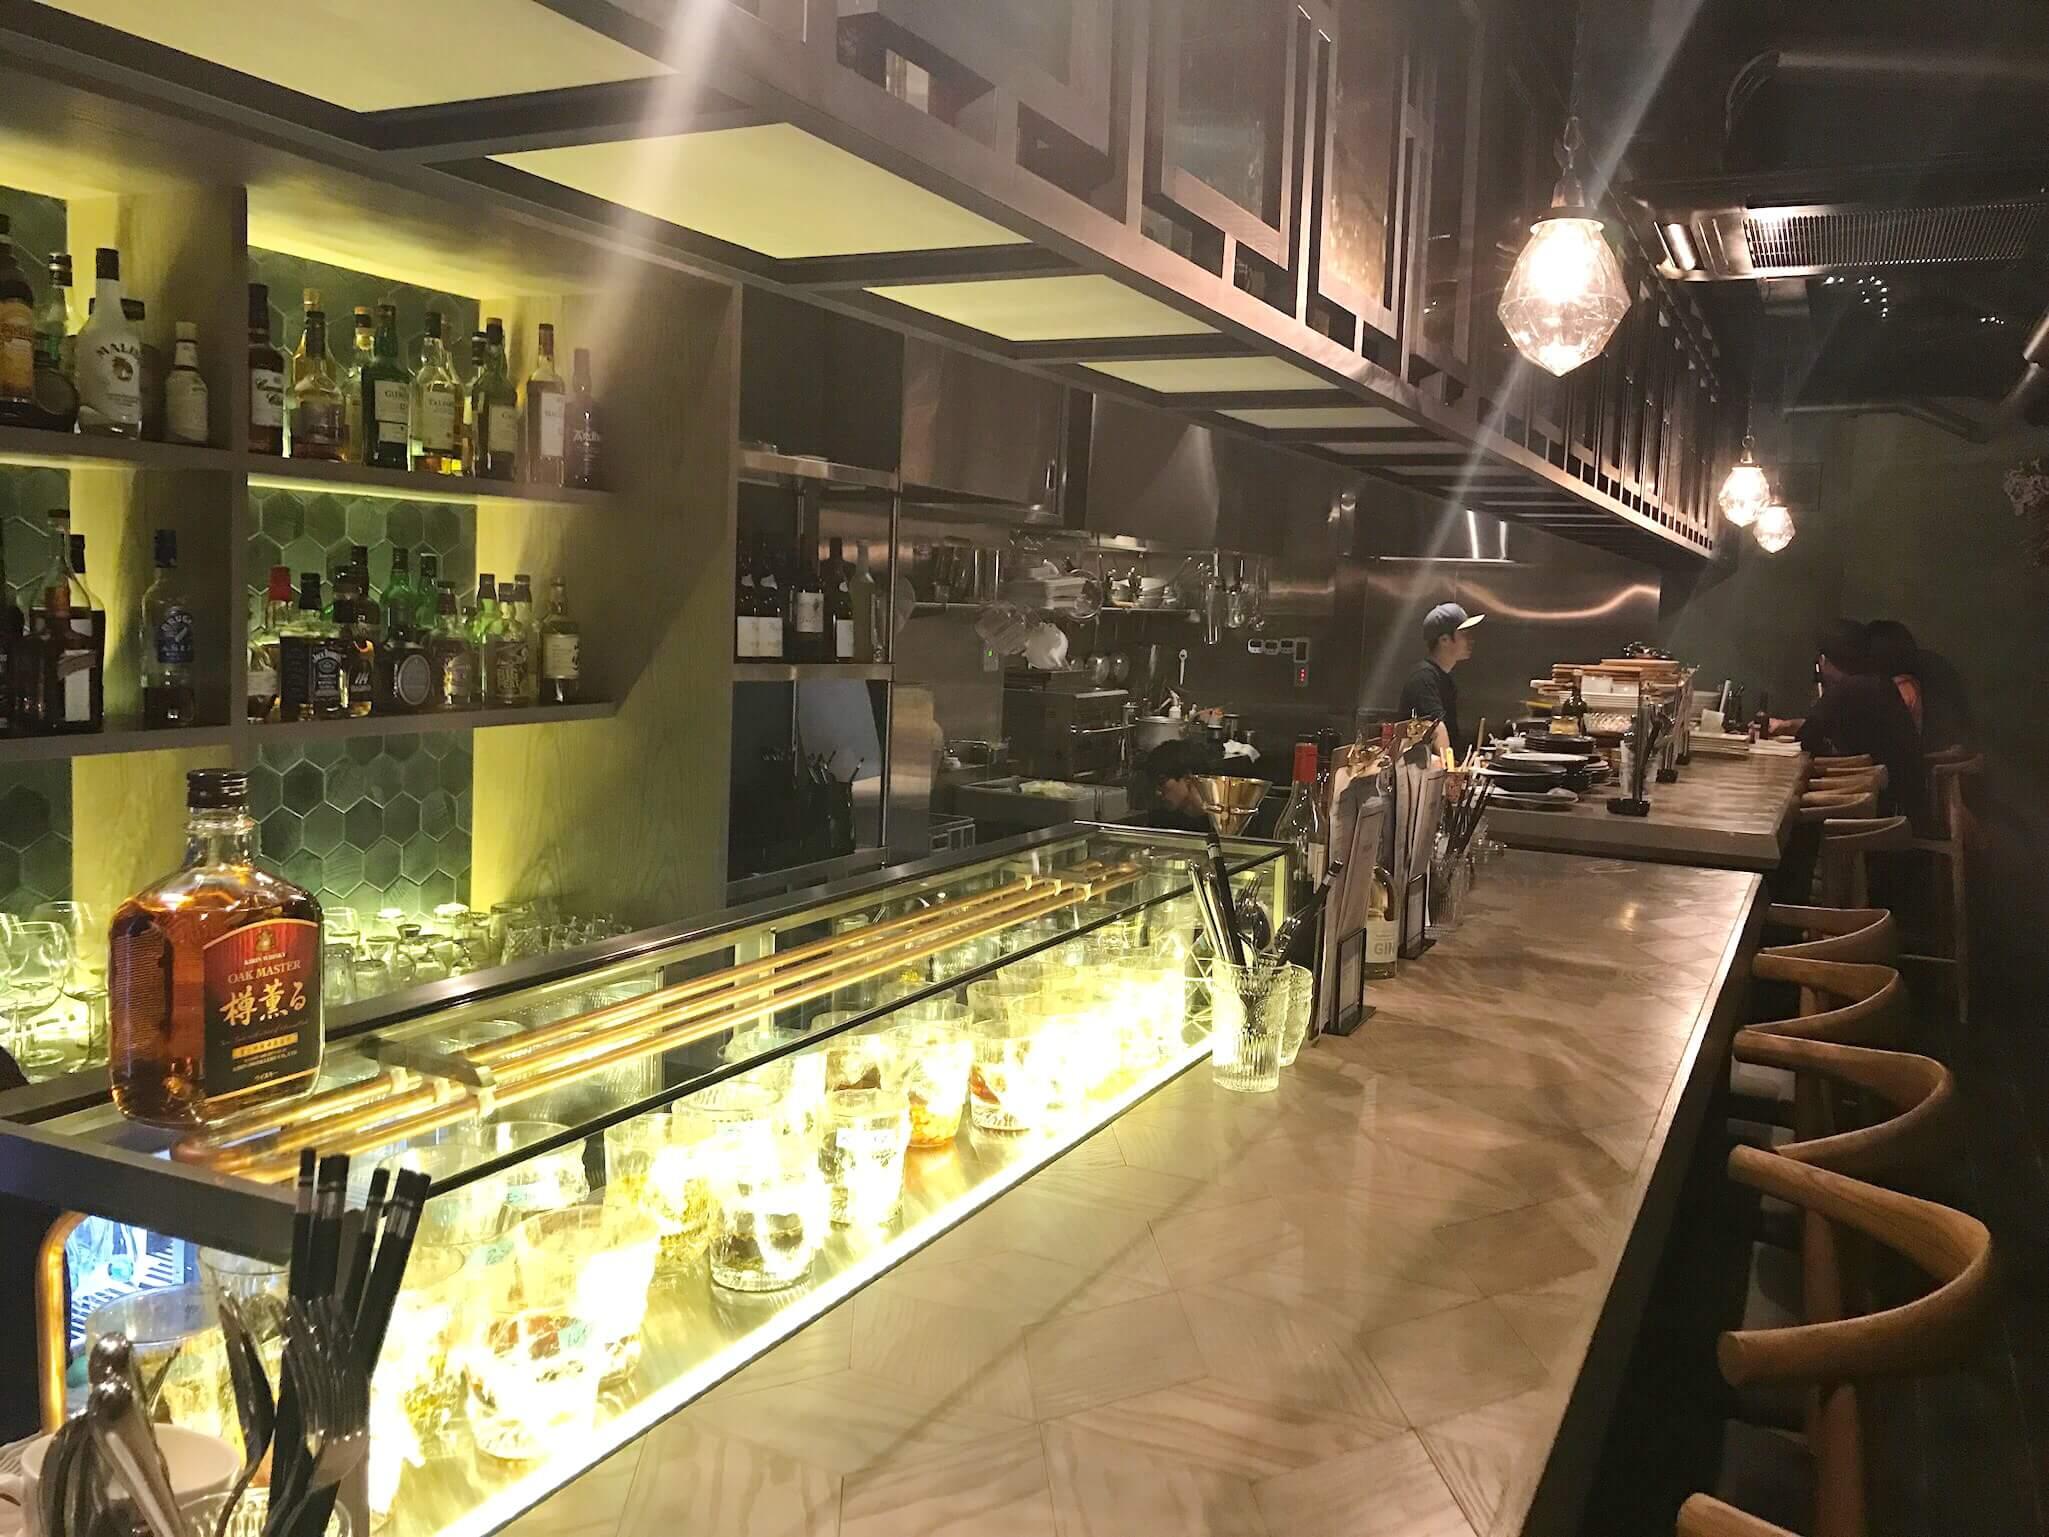 「 Starlit ( スターリット )」片町で見つけた星が煌めく素敵な空間 は、リーズナブルに多国籍料理と世界のクラフトビールを楽しめる場所だった♫